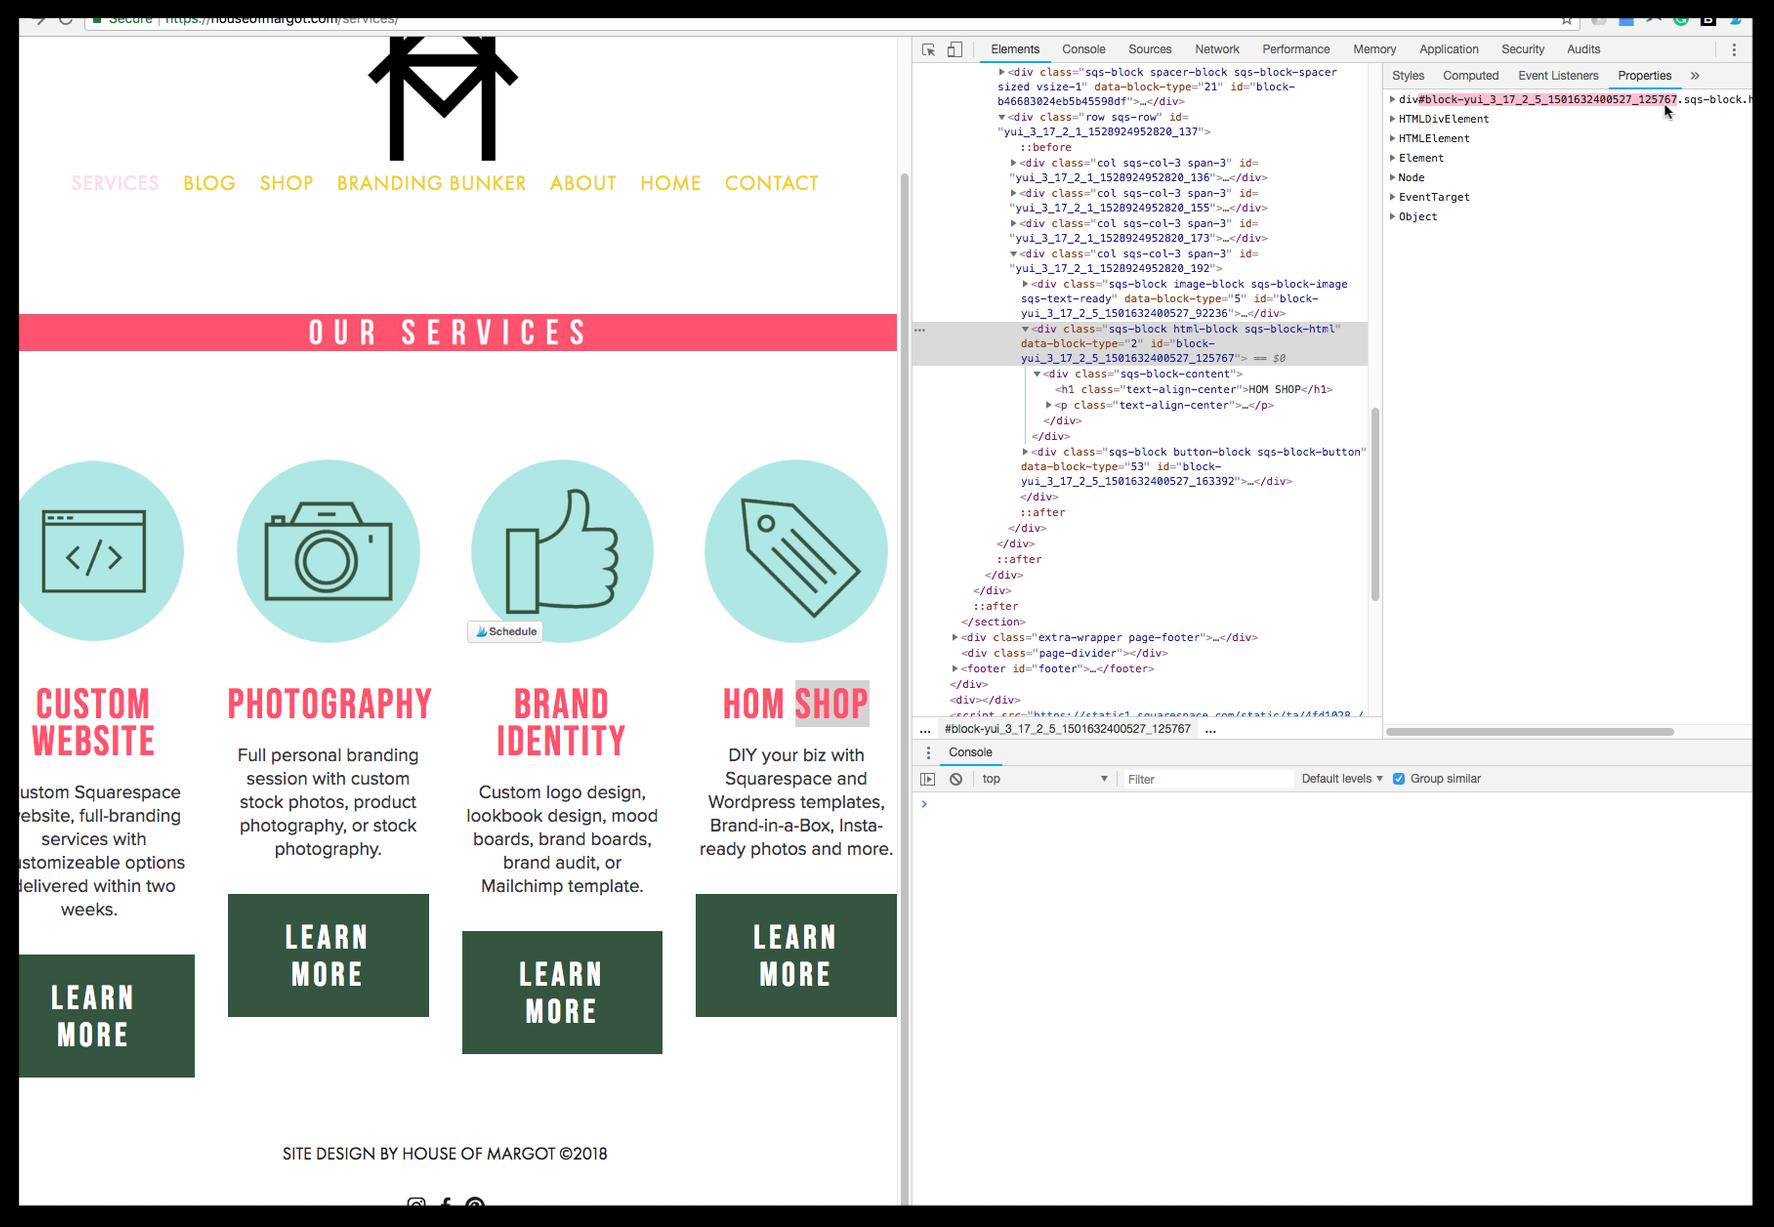 css-squarespace-tips-design-tool